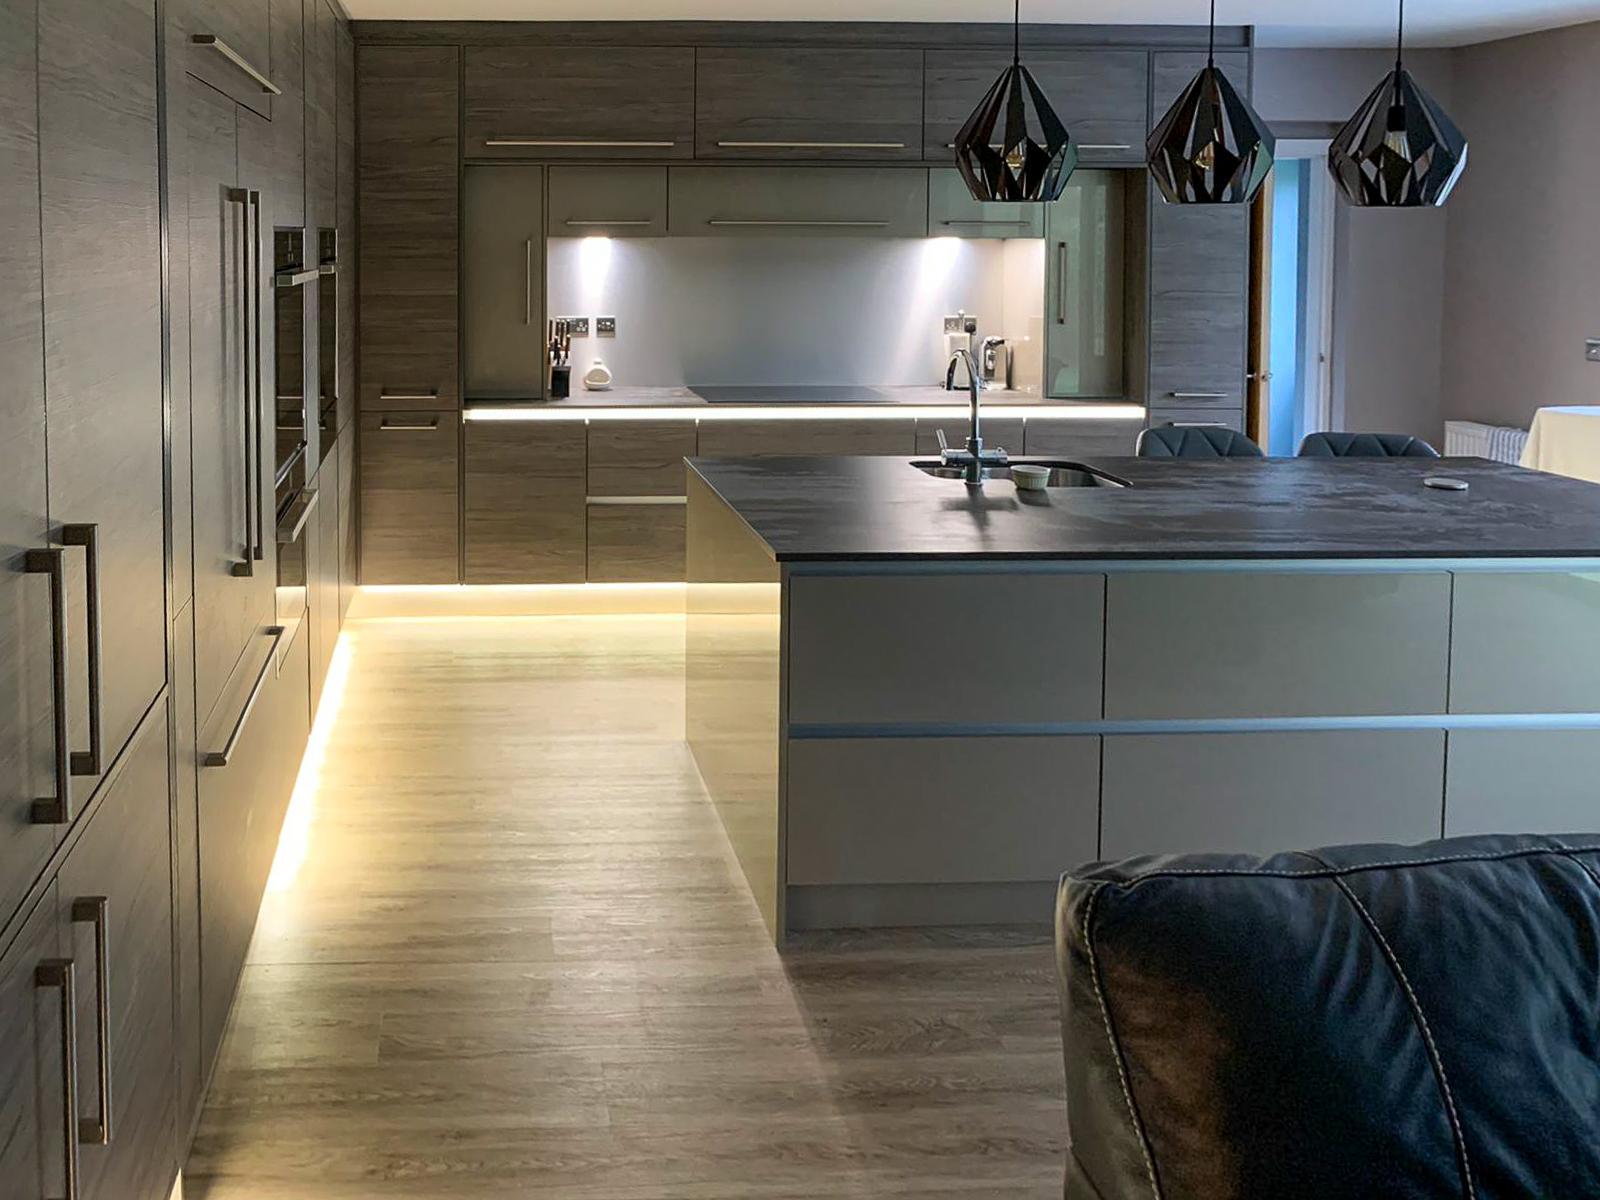 Modern kitchen on ground floor of double extension